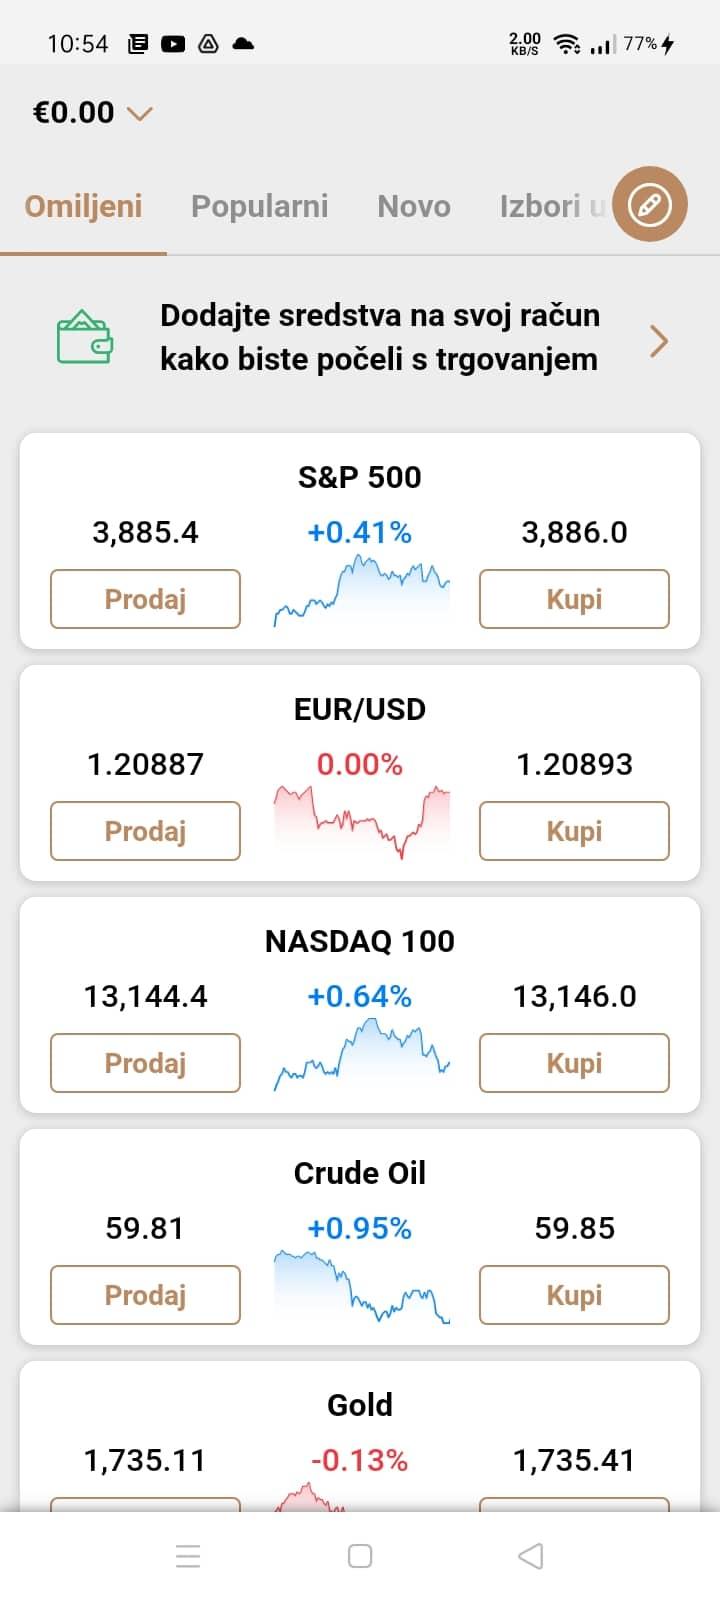 prezentacija bitcoin ulaganja koju kriptovalutu uložiti u 2021 pennystock